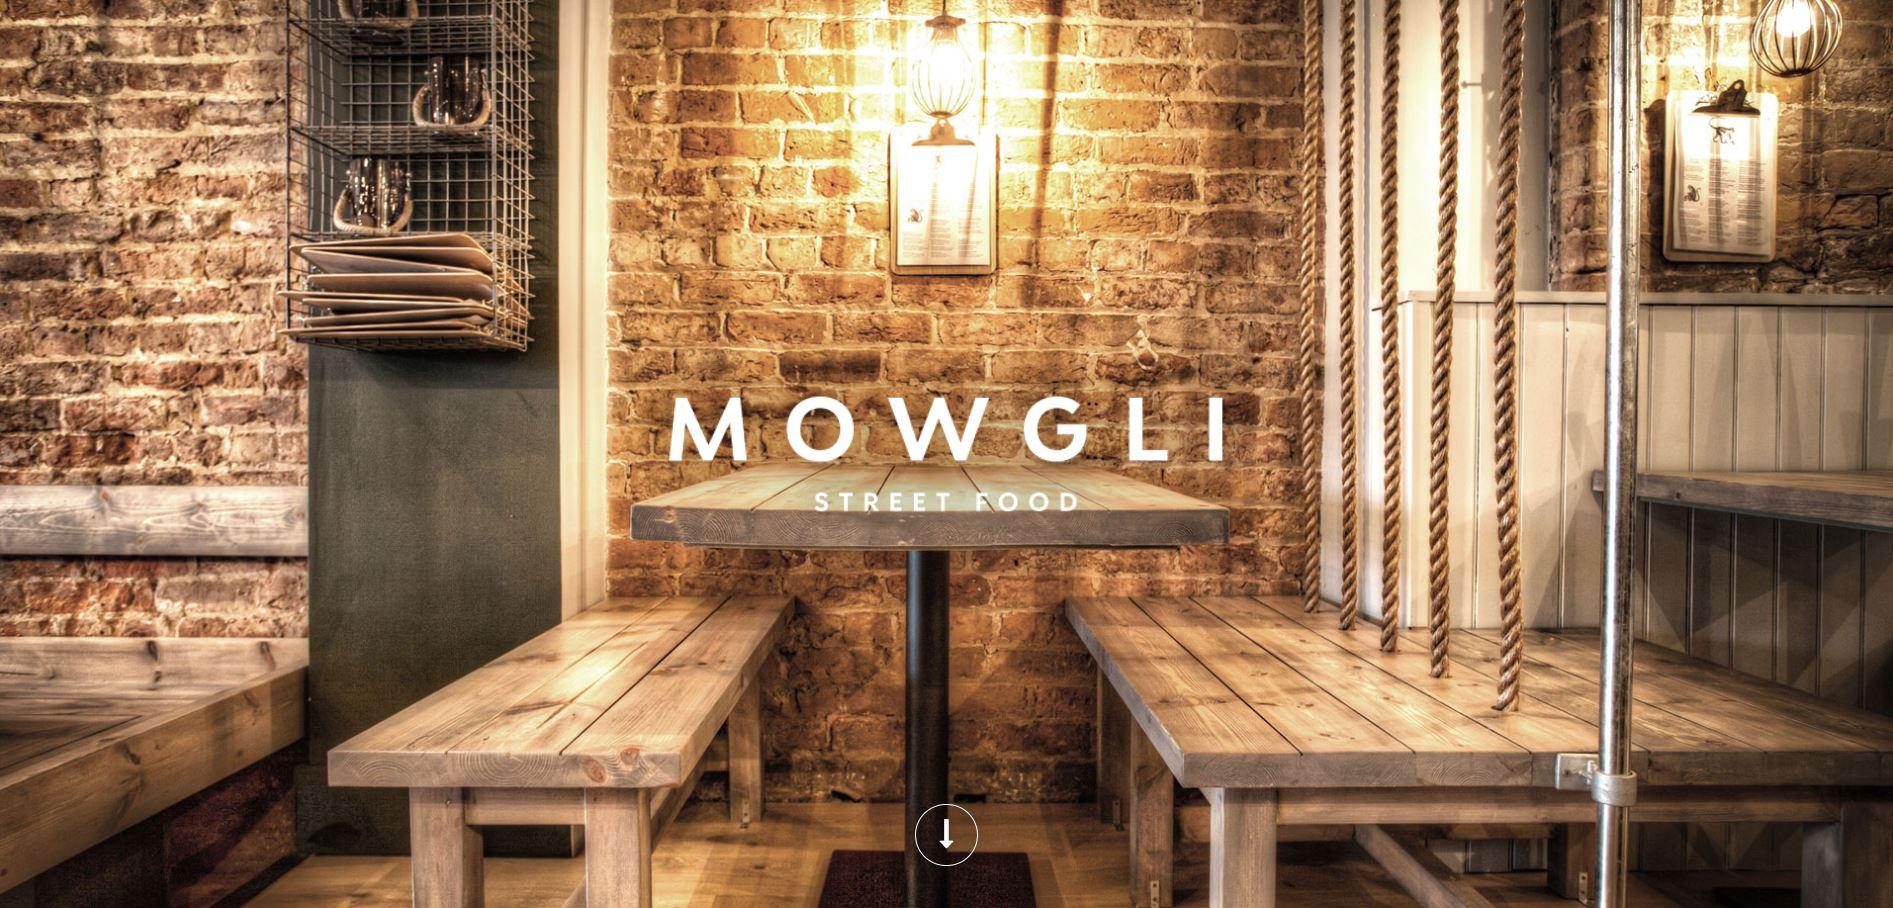 MOWGLI SET TO SWING INTO HOCKLEY NOTTINGHAM